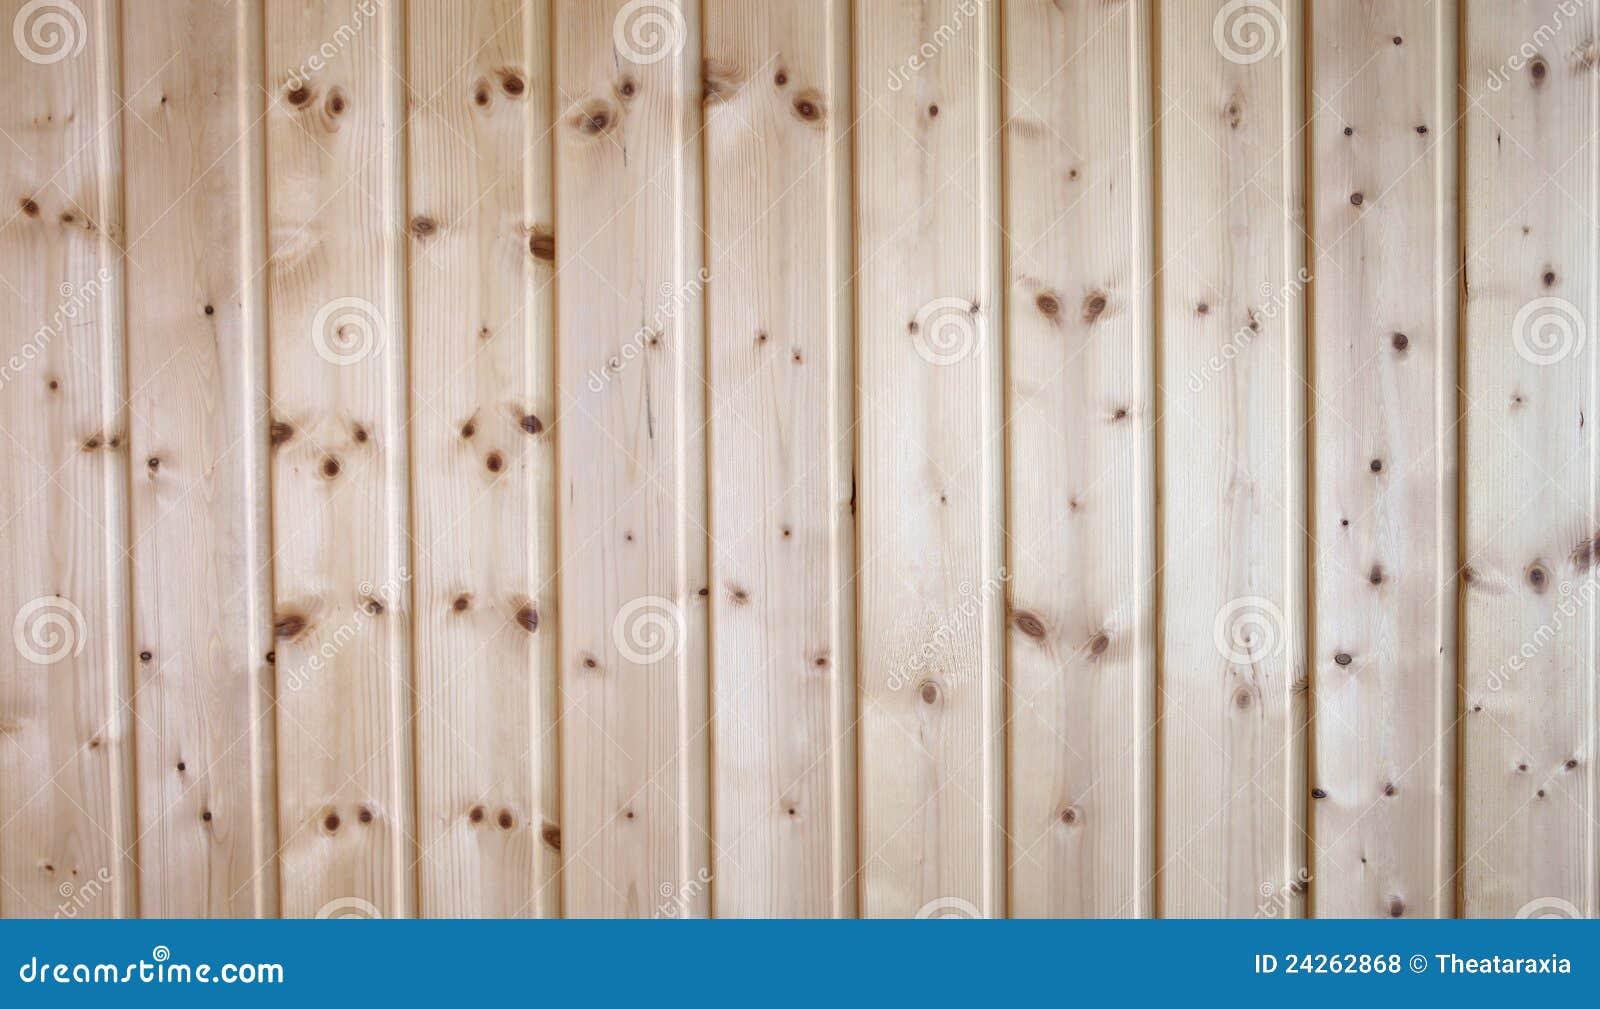 sauna holz wand lizenzfreie stockfotos bild 24262868. Black Bedroom Furniture Sets. Home Design Ideas